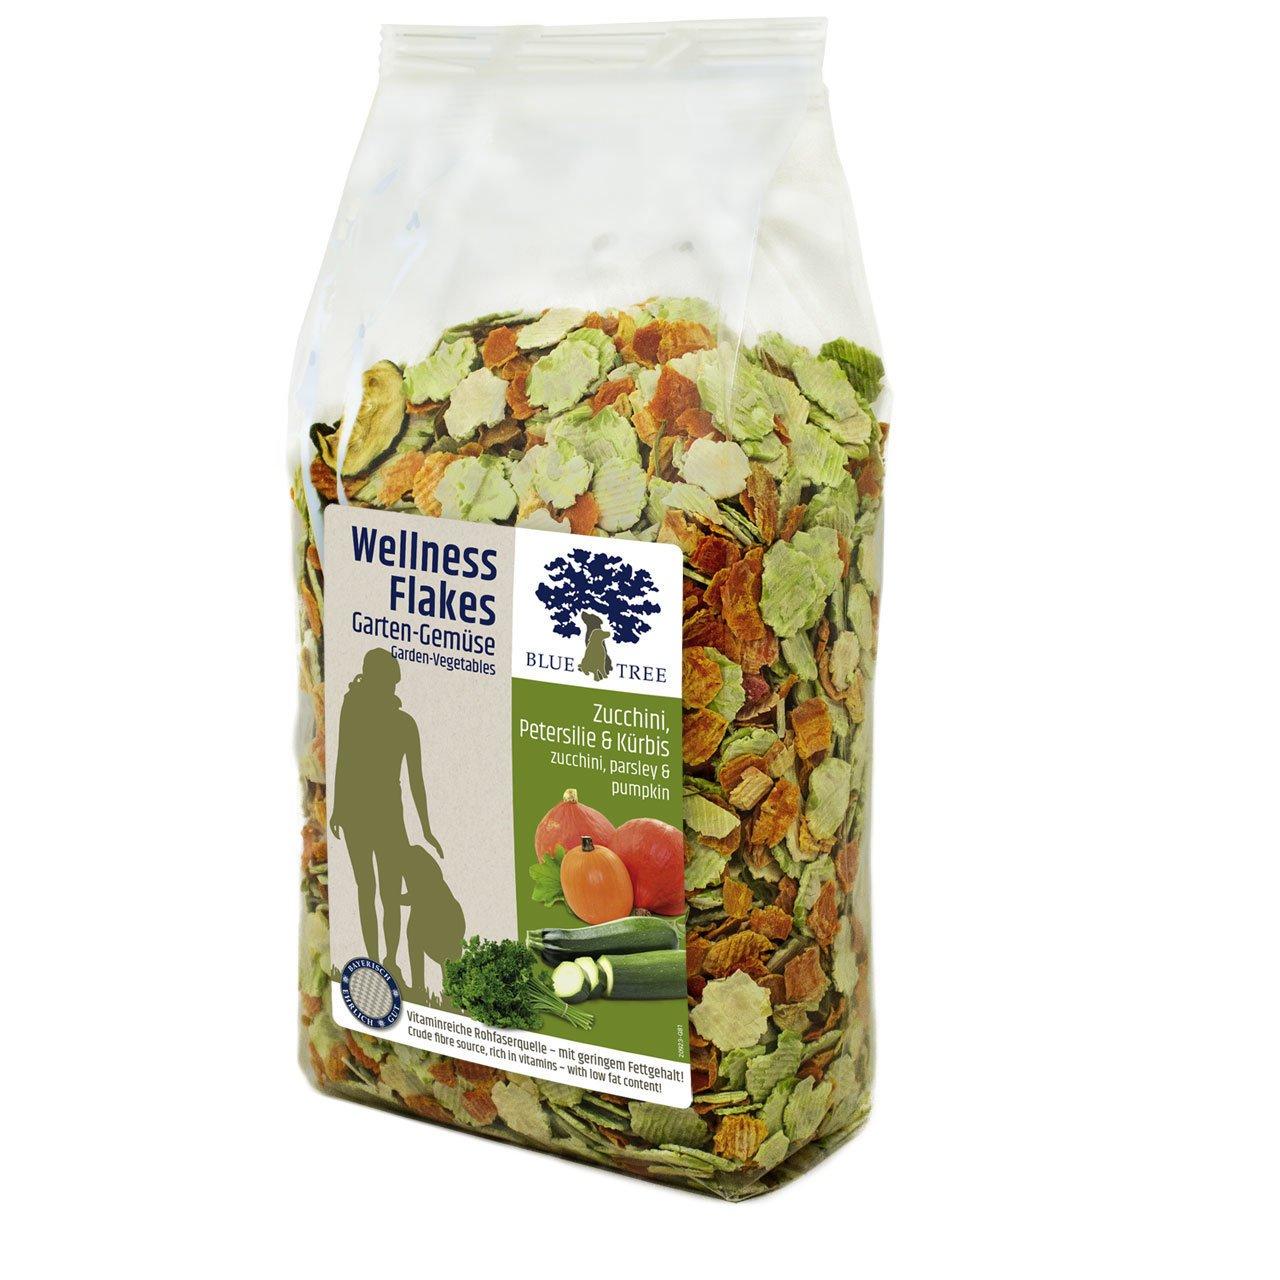 Blue Tree Wellness Flakes für Hunde, Garten-Gemüse 650g